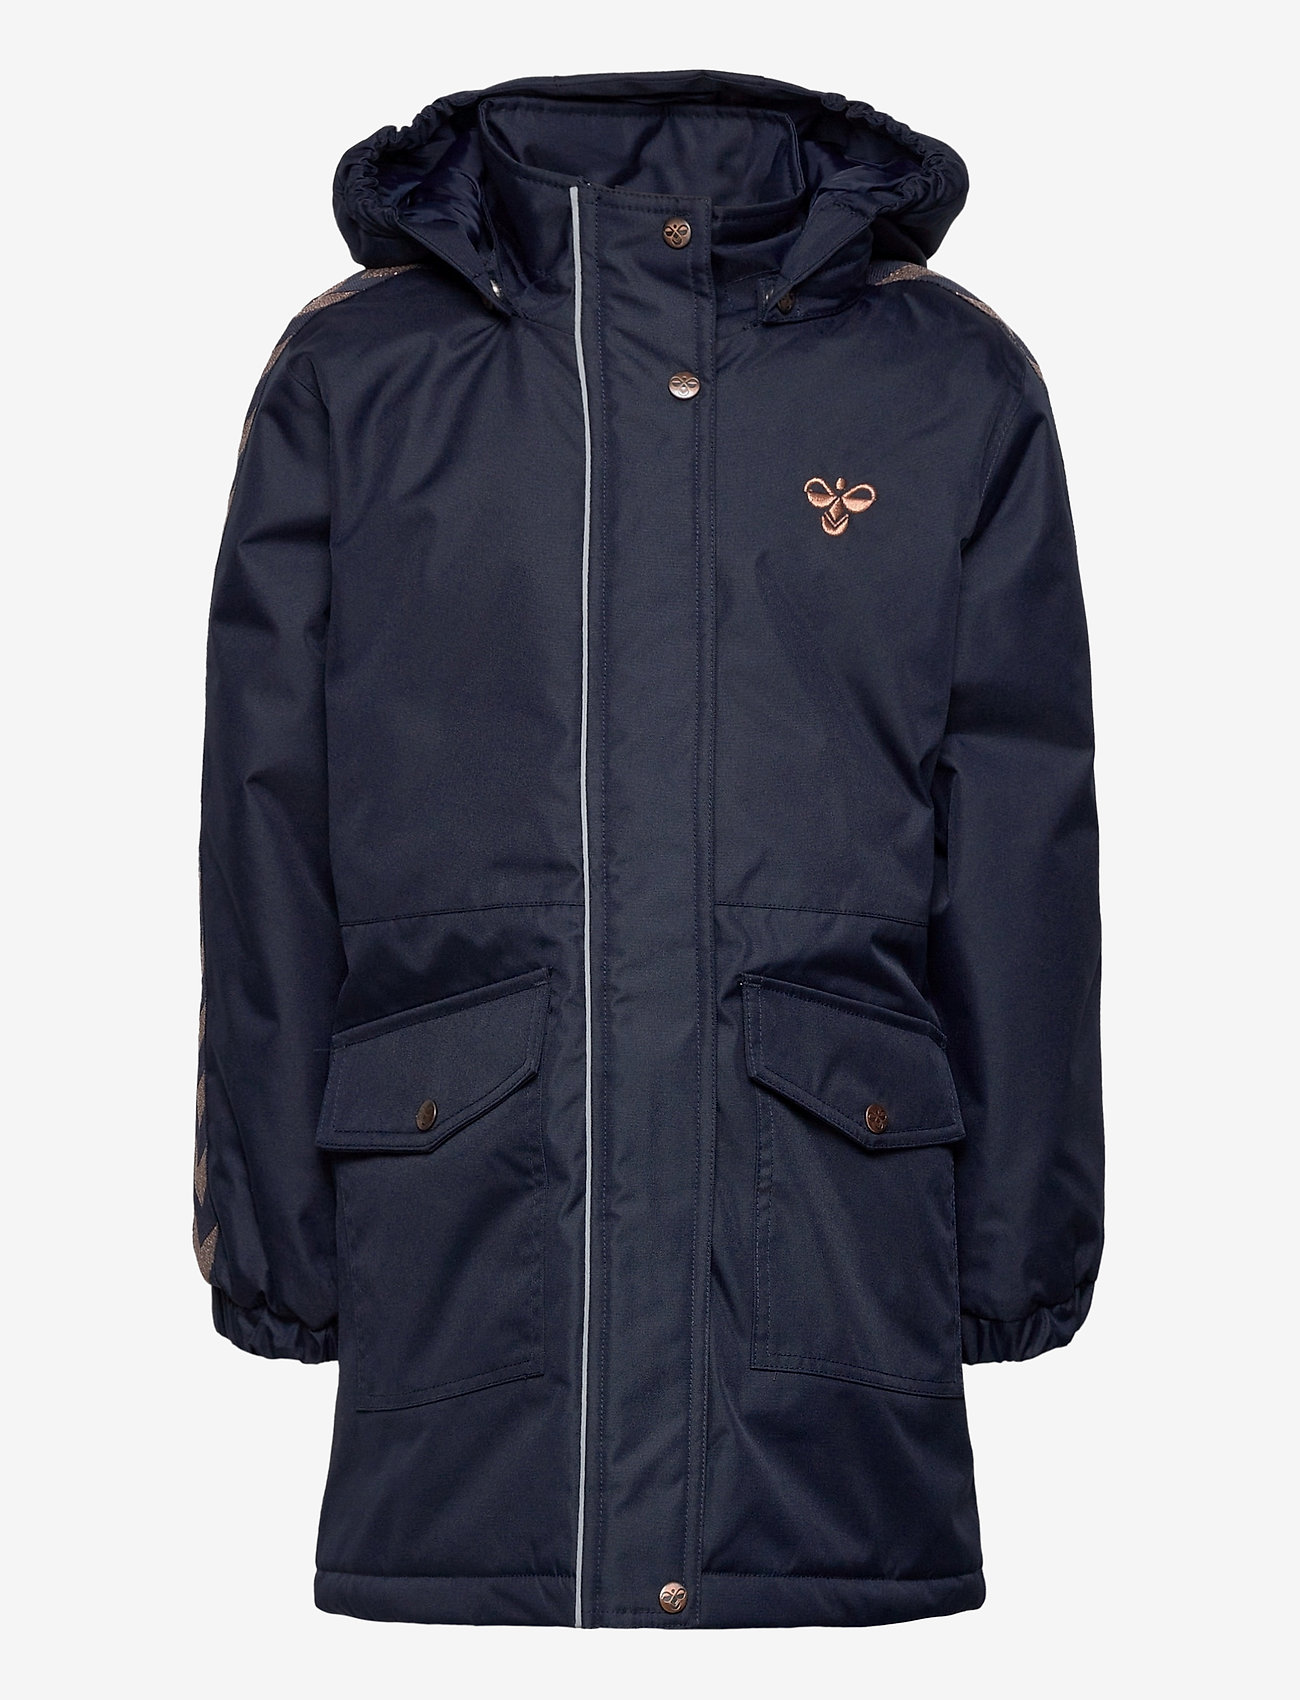 Hummel - hmlJEANNE COAT - ski jackets - black iris - 1